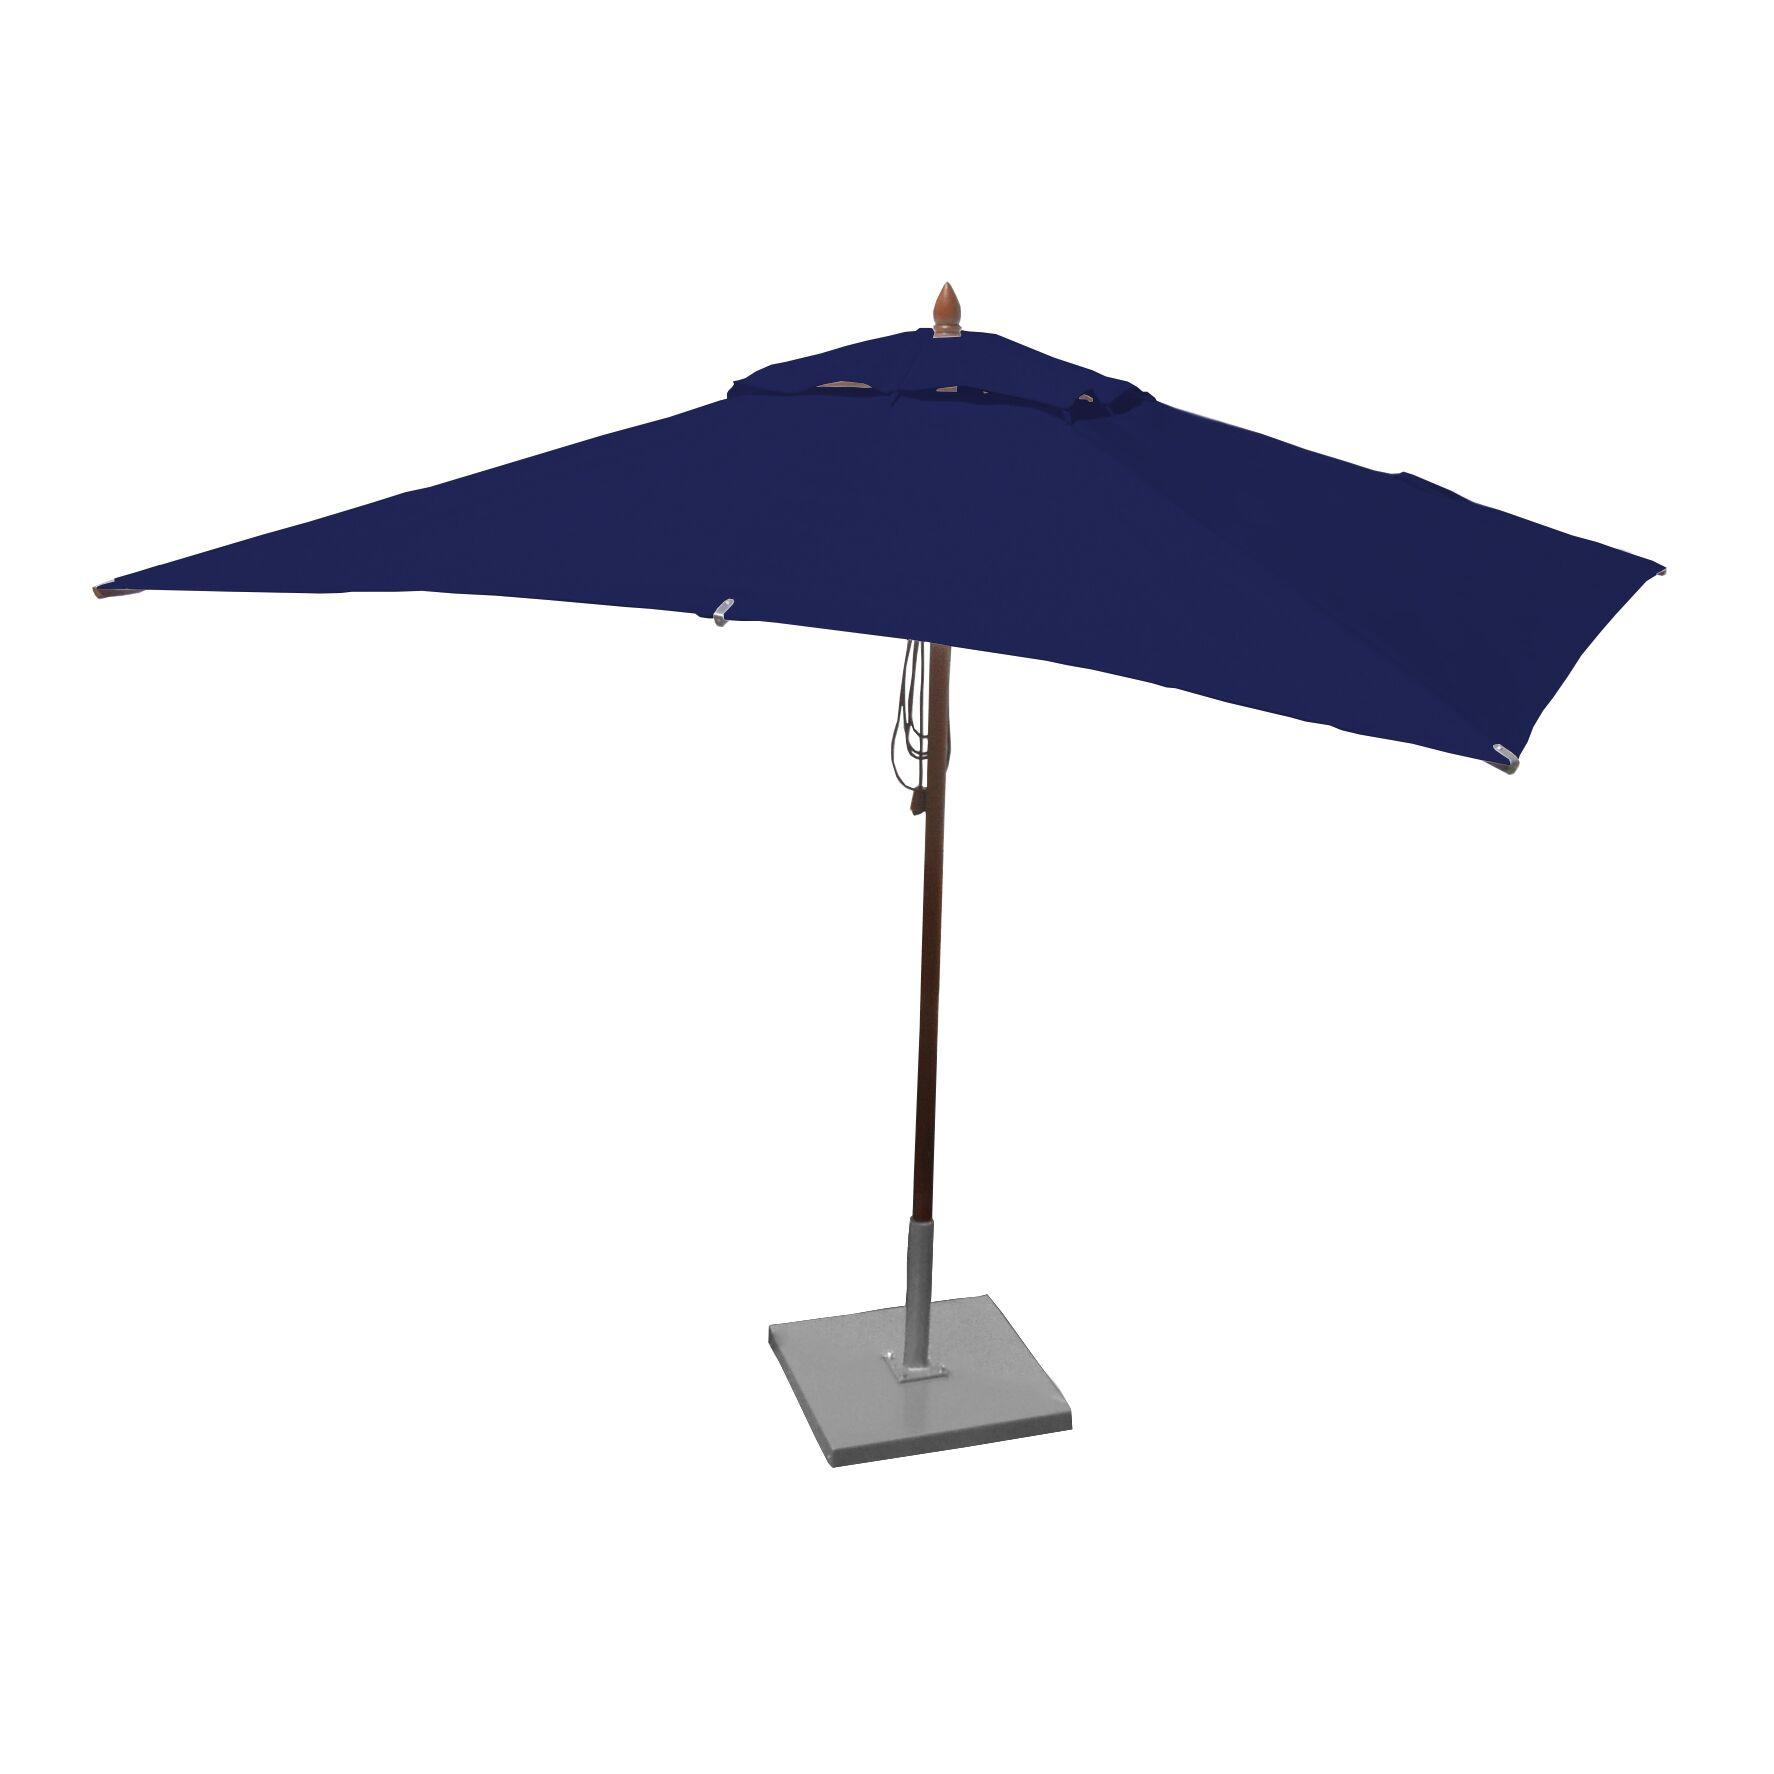 Sharon 6.5' X 10' Rectangular Market Umbrella Fabric: Ocean Blue